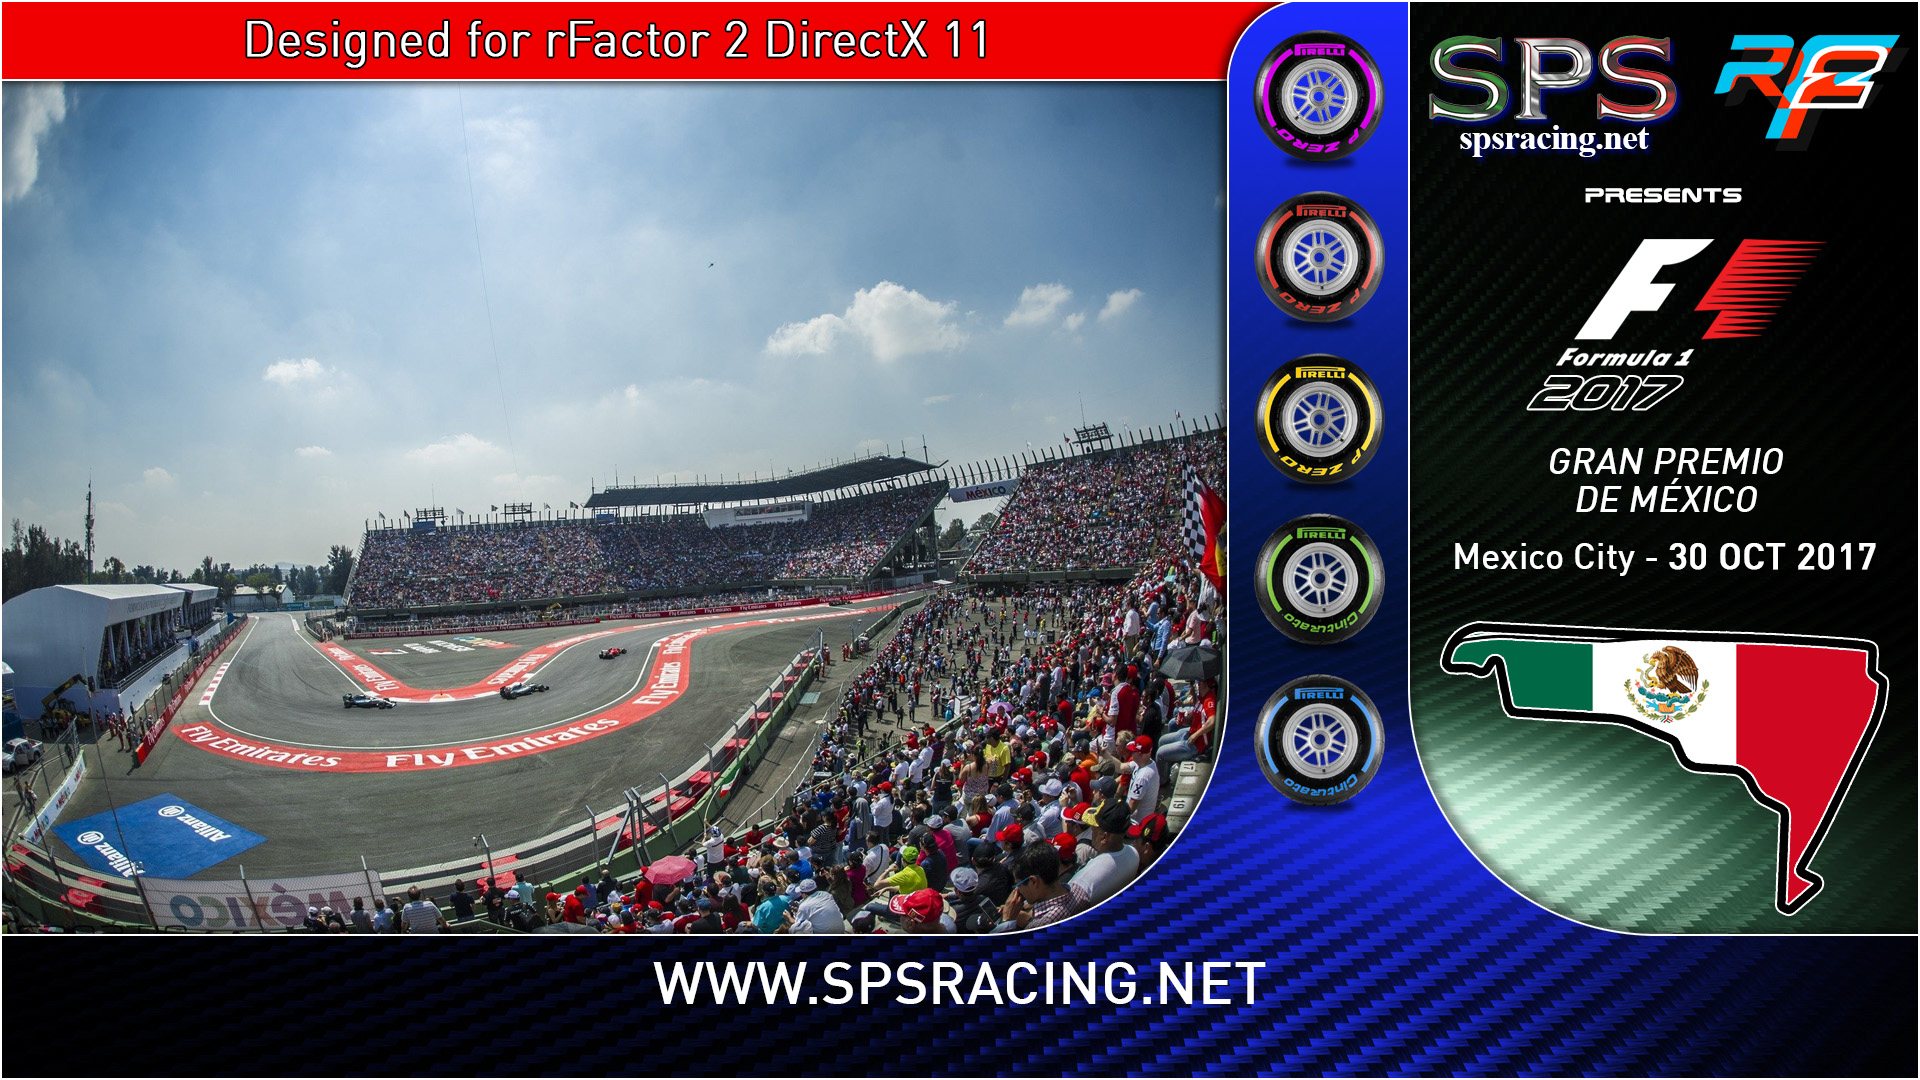 Round 18 - Mexico GP